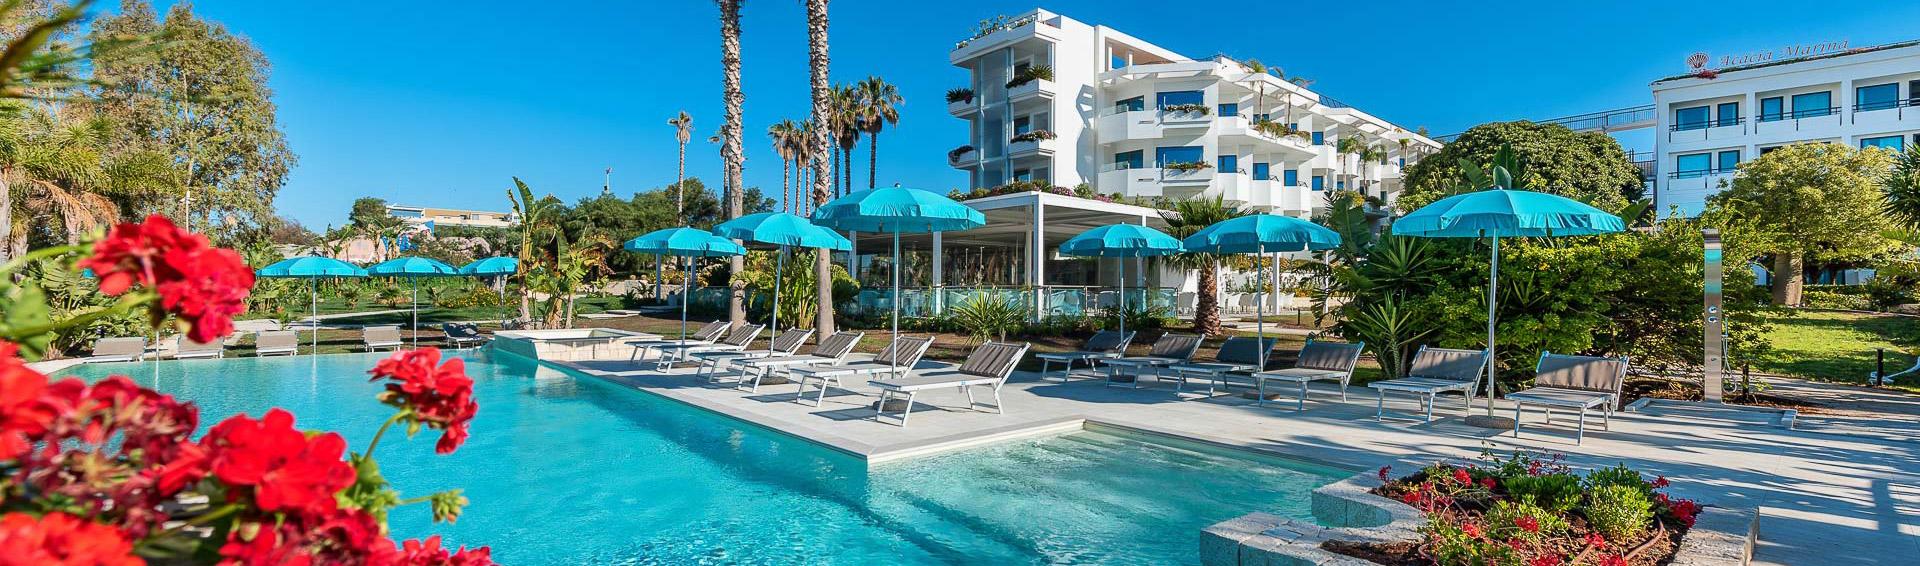 Hotel Marina di Ragusa Acacia Palace - pool